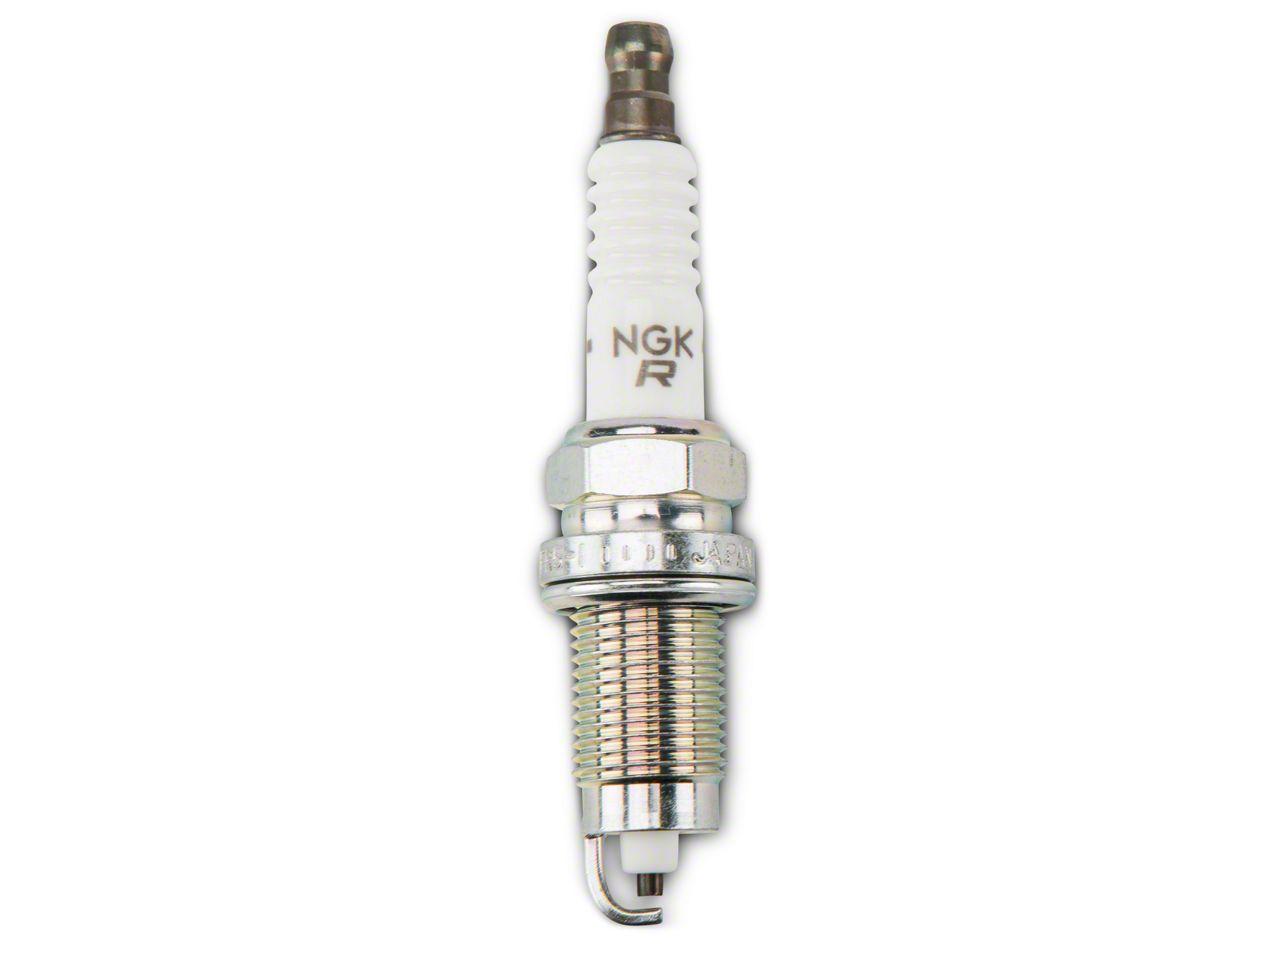 NGK V-Power Spark Plug (87-02 2.5L, 91-98 4.0L Jeep Wrangler TJ & YJ)